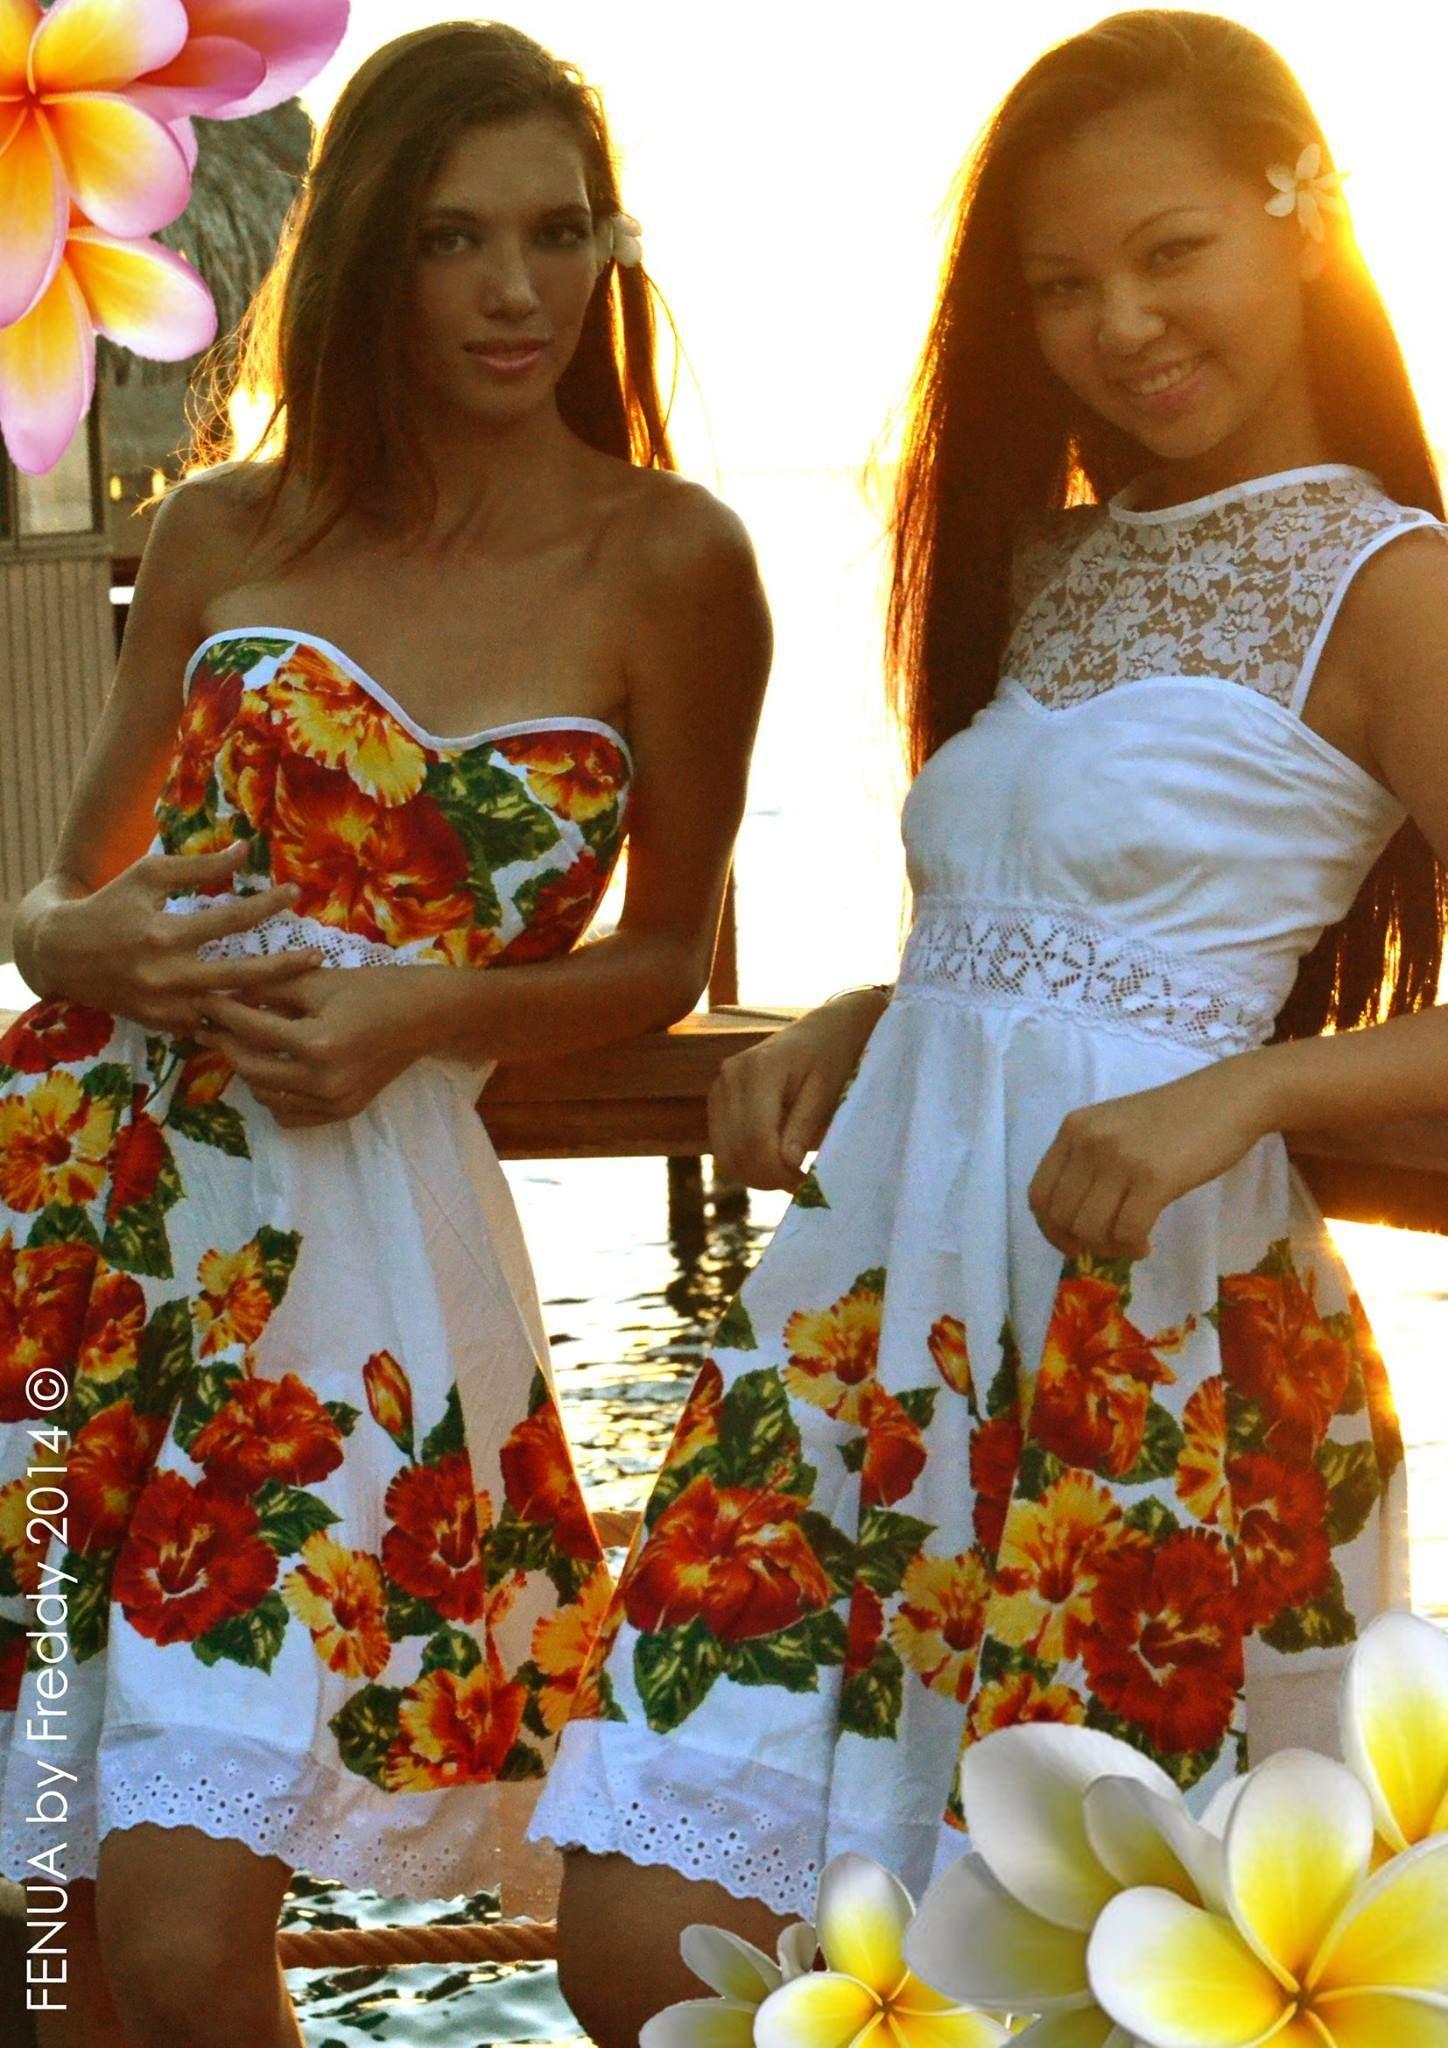 pingl par velmay eliu sur polynesian inspired